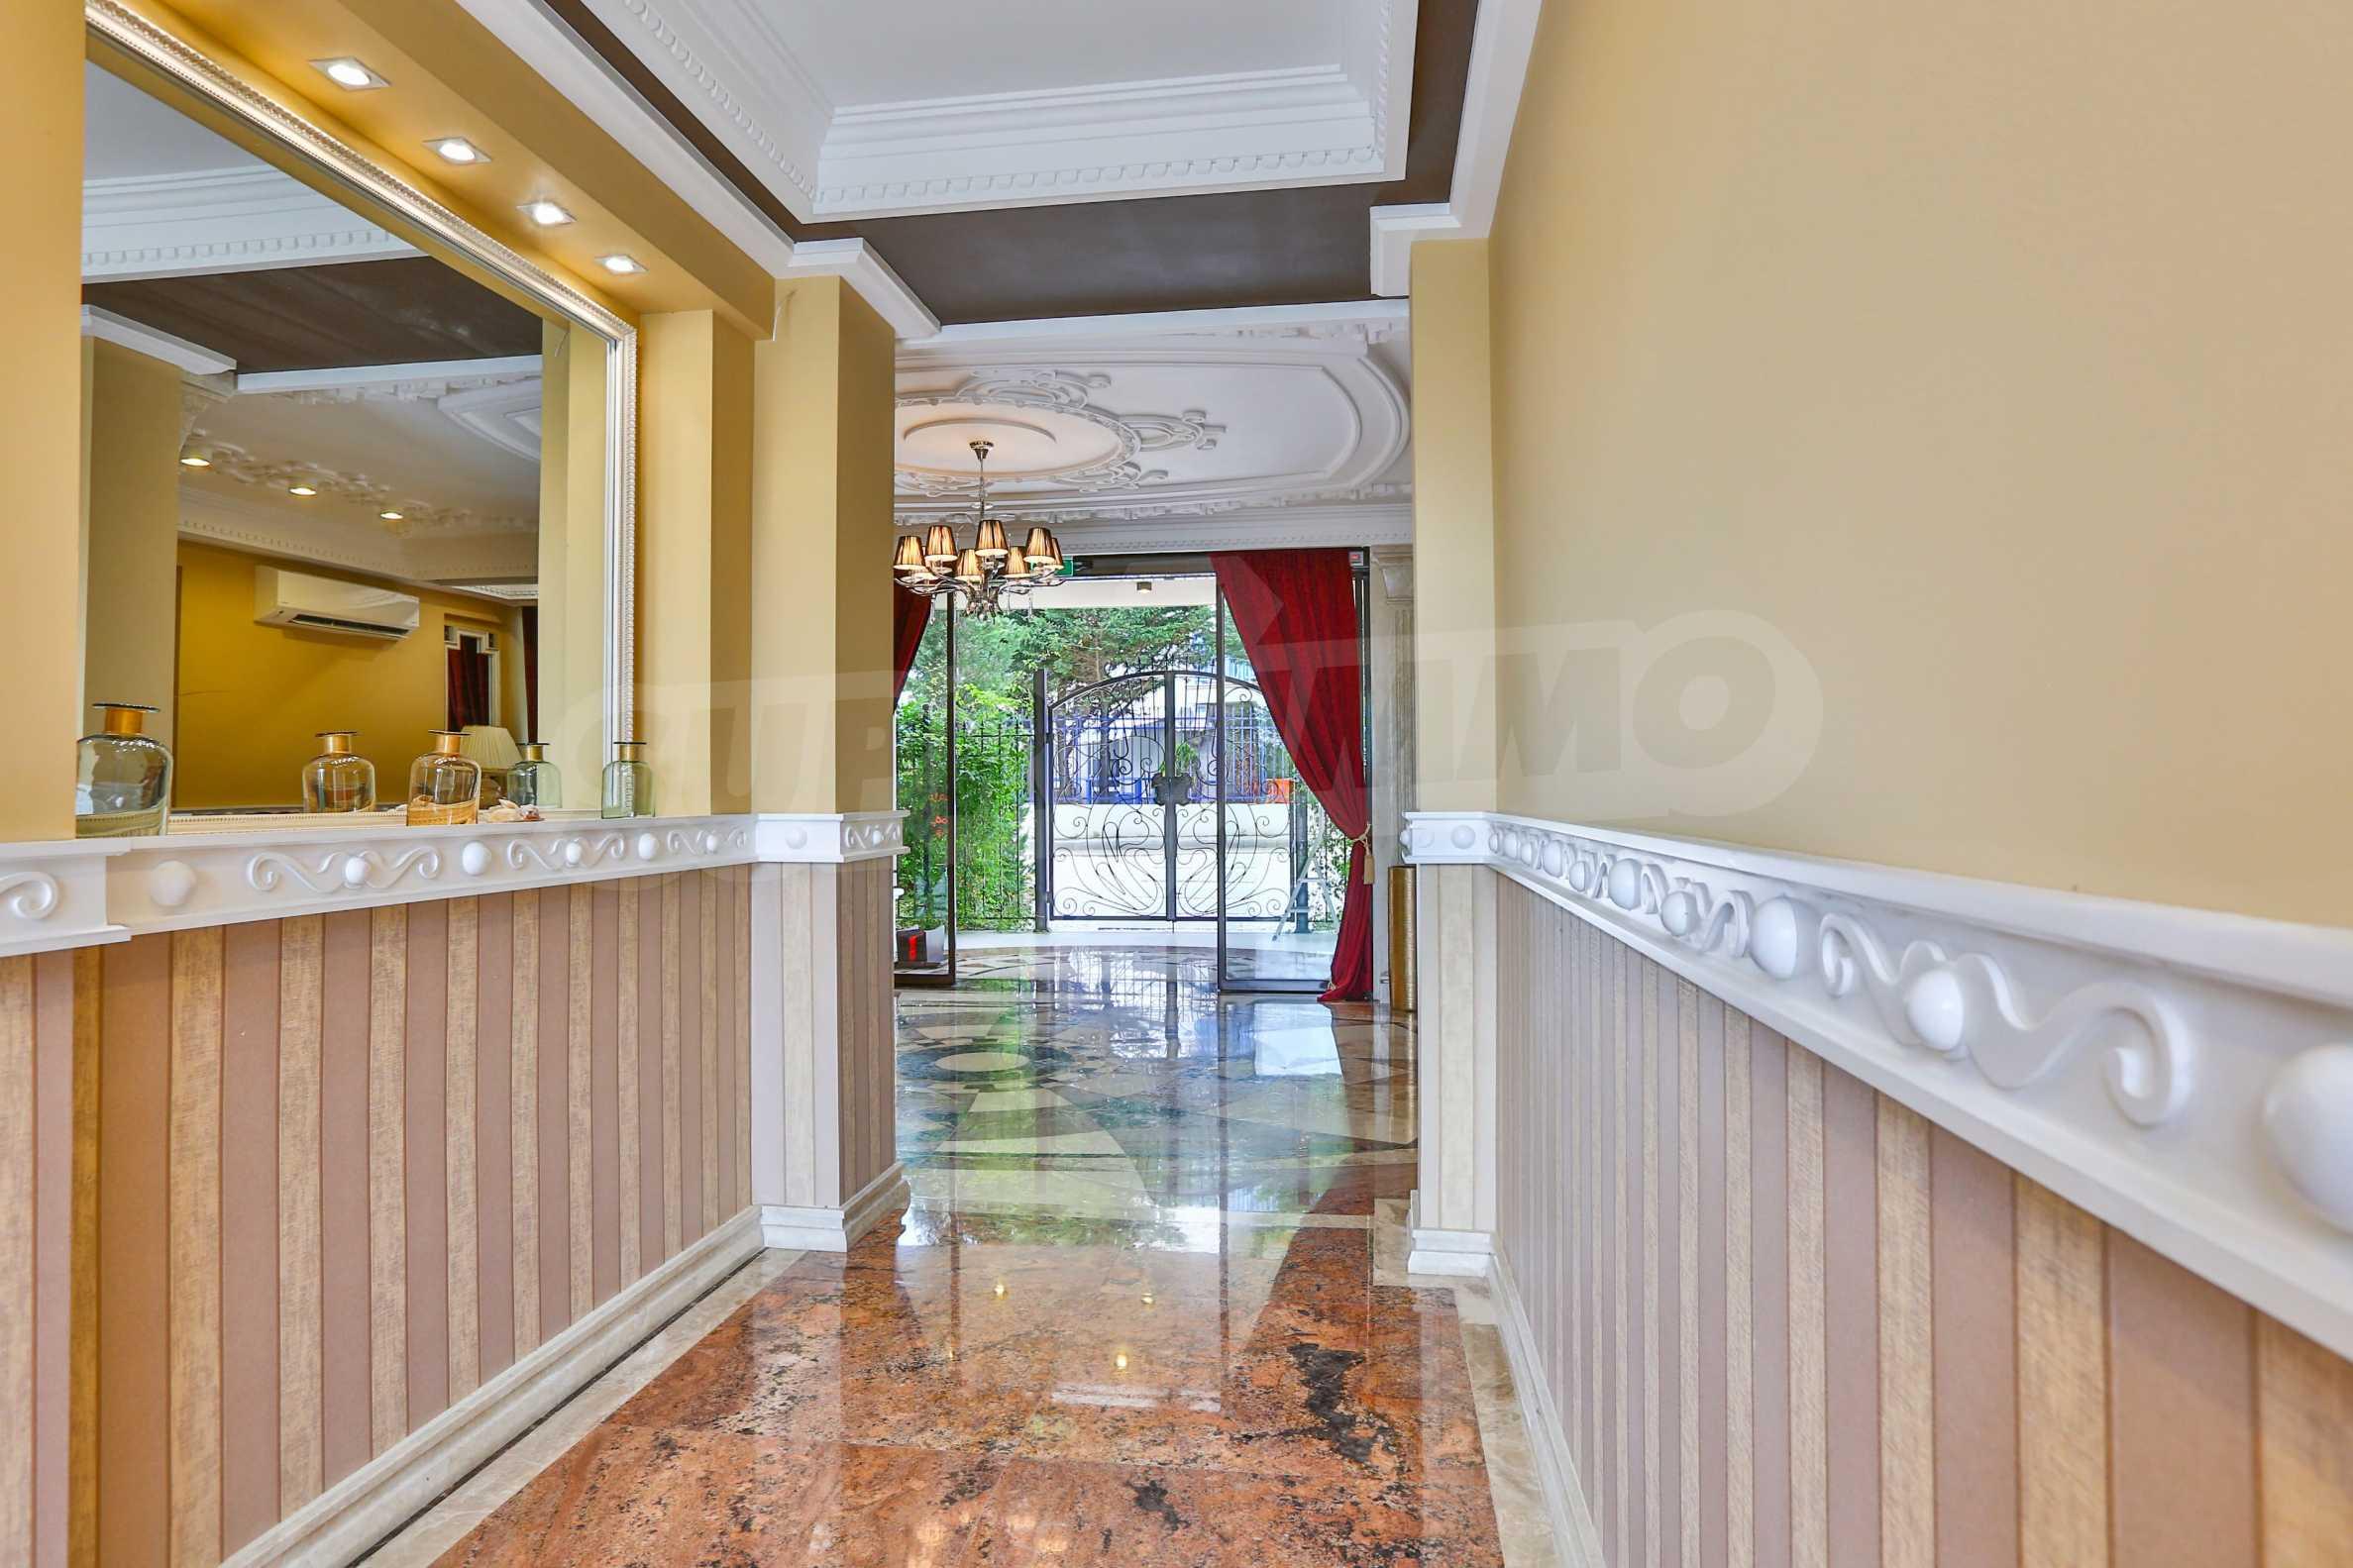 Дизайнерски тристаен апартамент под наем за летен сезон в резиденция Belle Époque в Лозенец 33